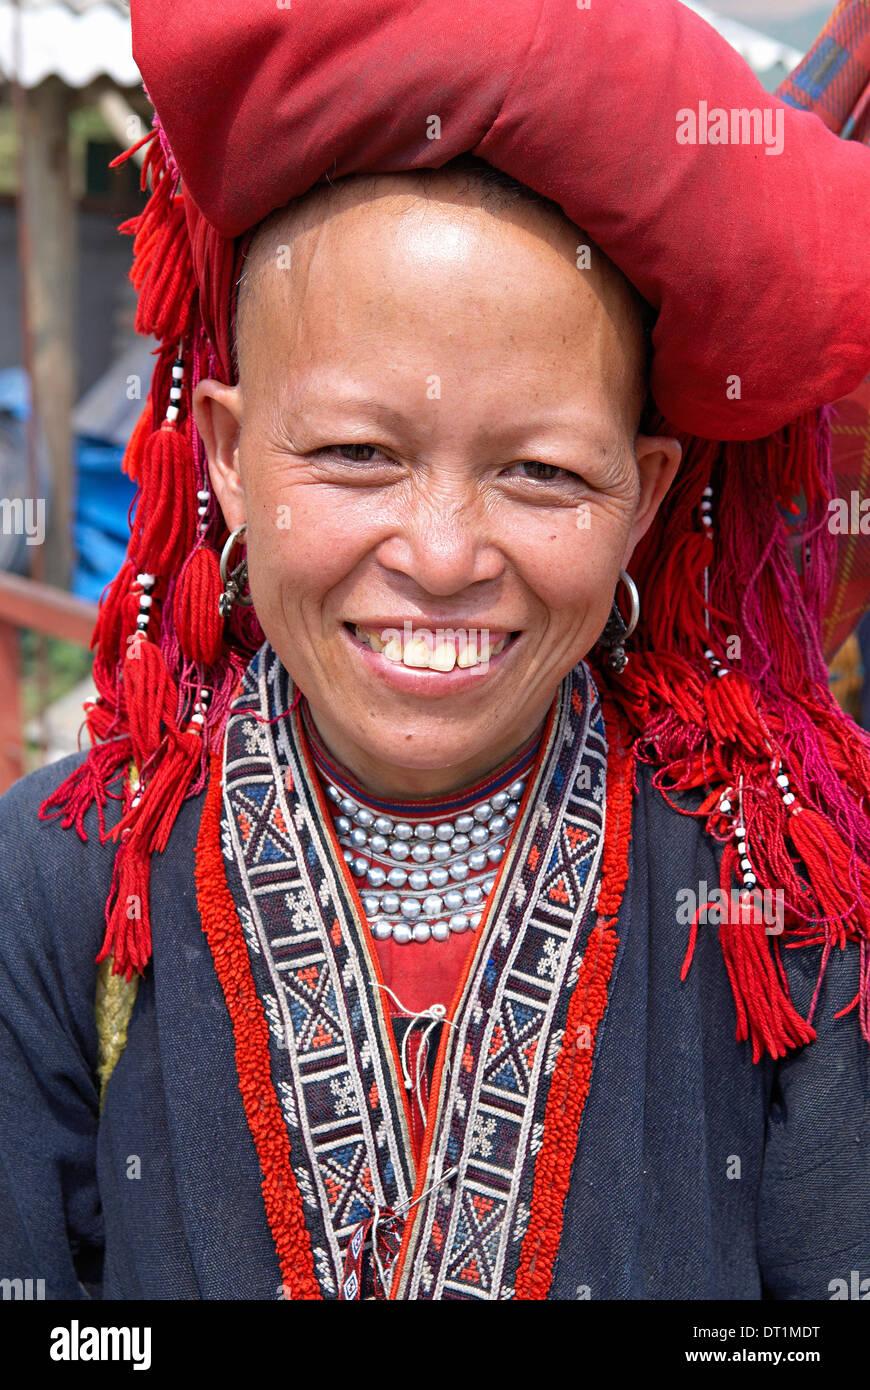 Red Dao ethnic group, Sapa area, Tonkin, Vietnam, Indochina, Southeast Asia, Asia - Stock Image